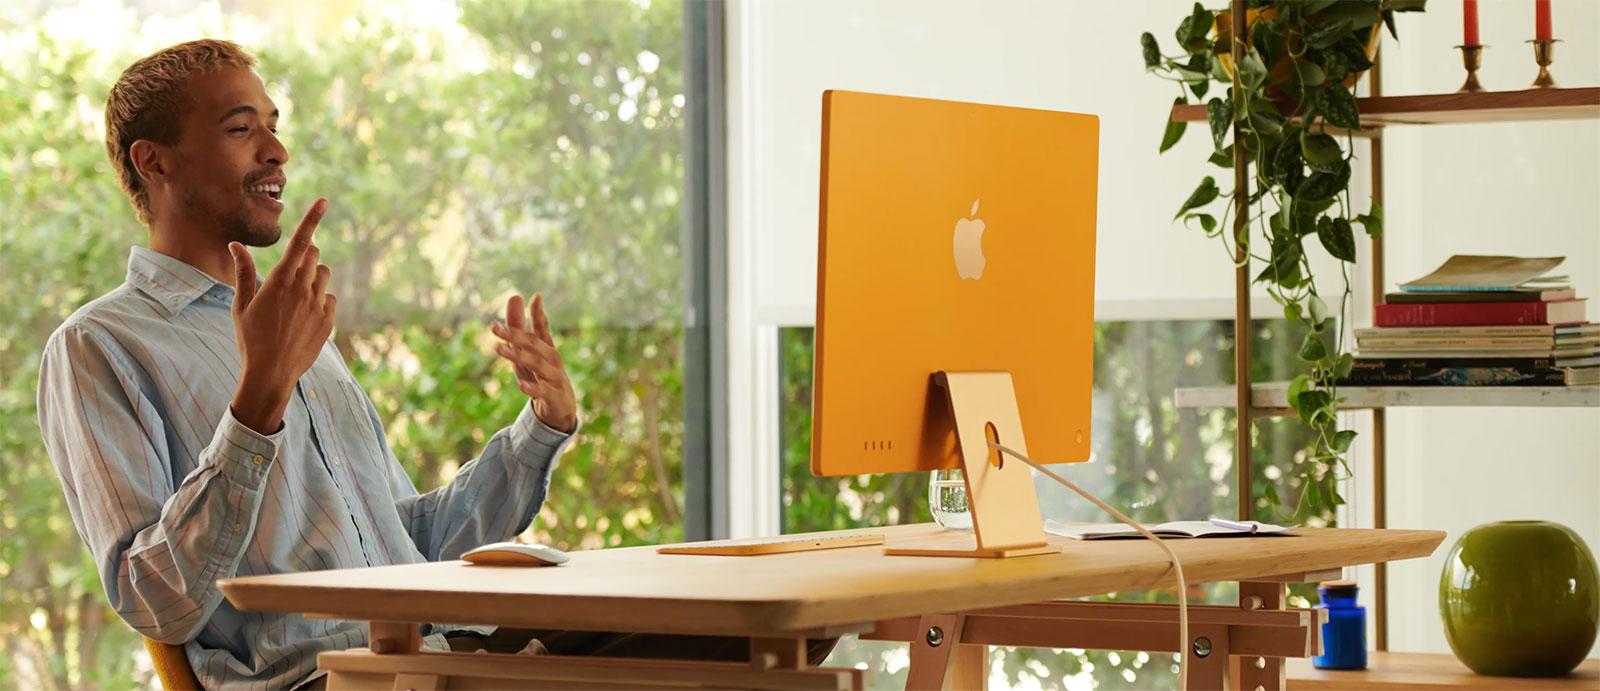 iMac Apple Silicon en amarillo